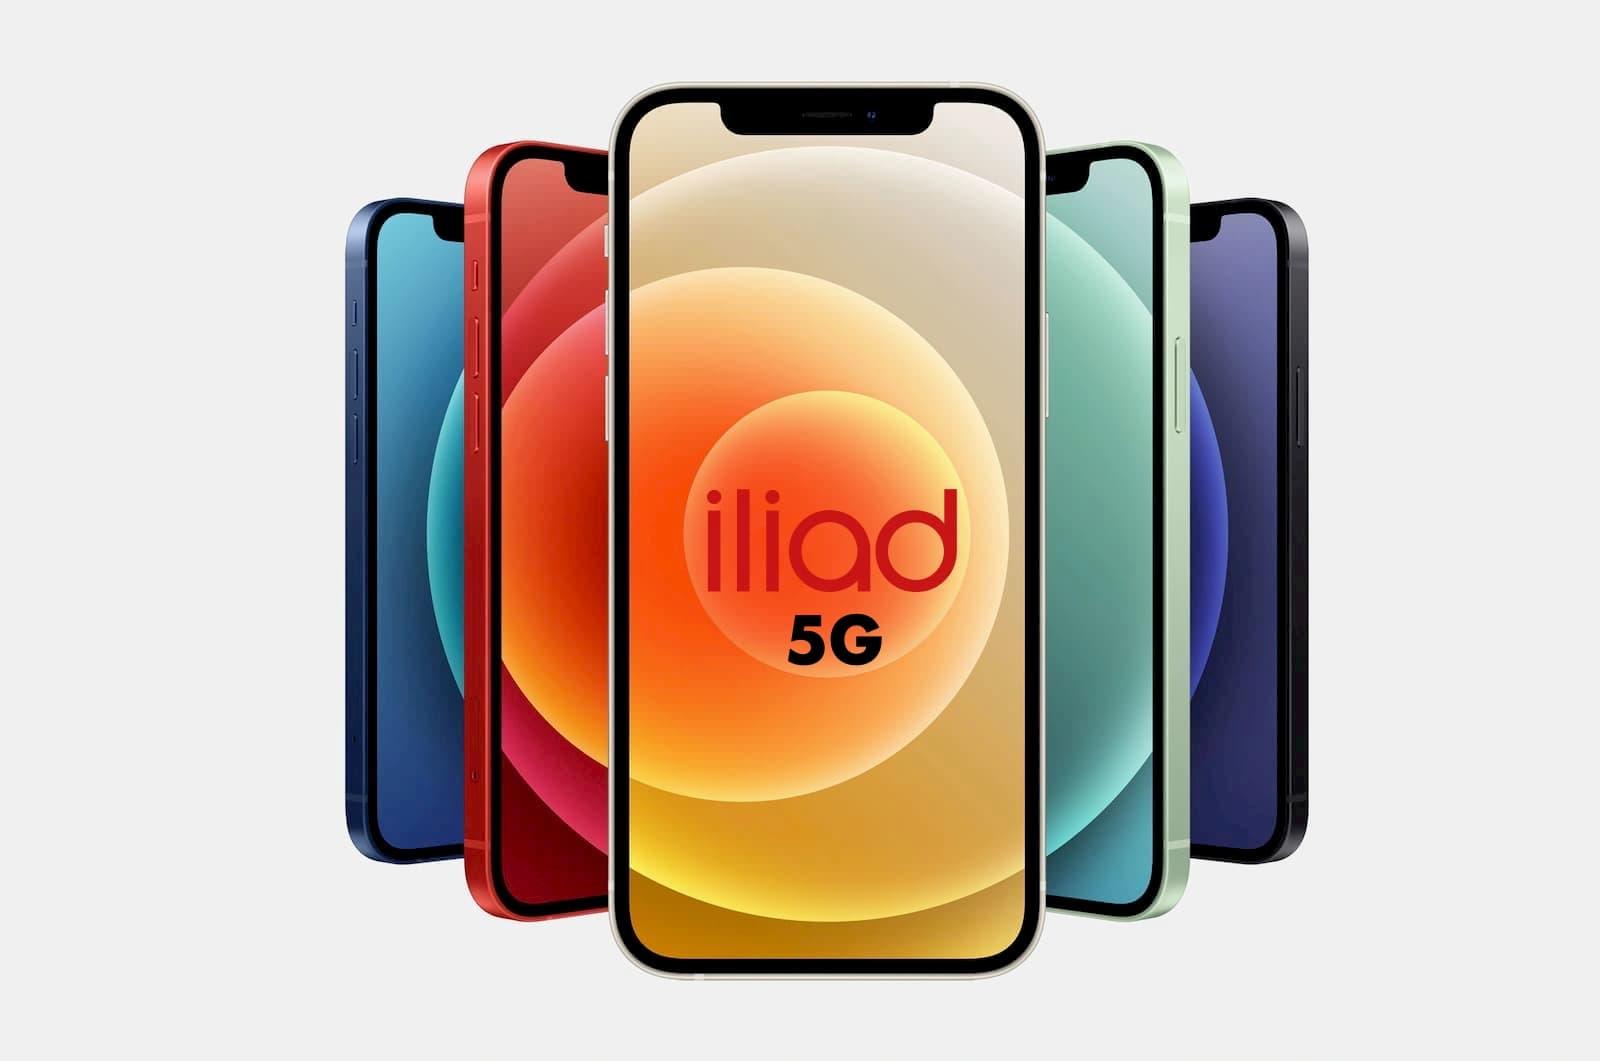 iPhone 12 iliad 5G